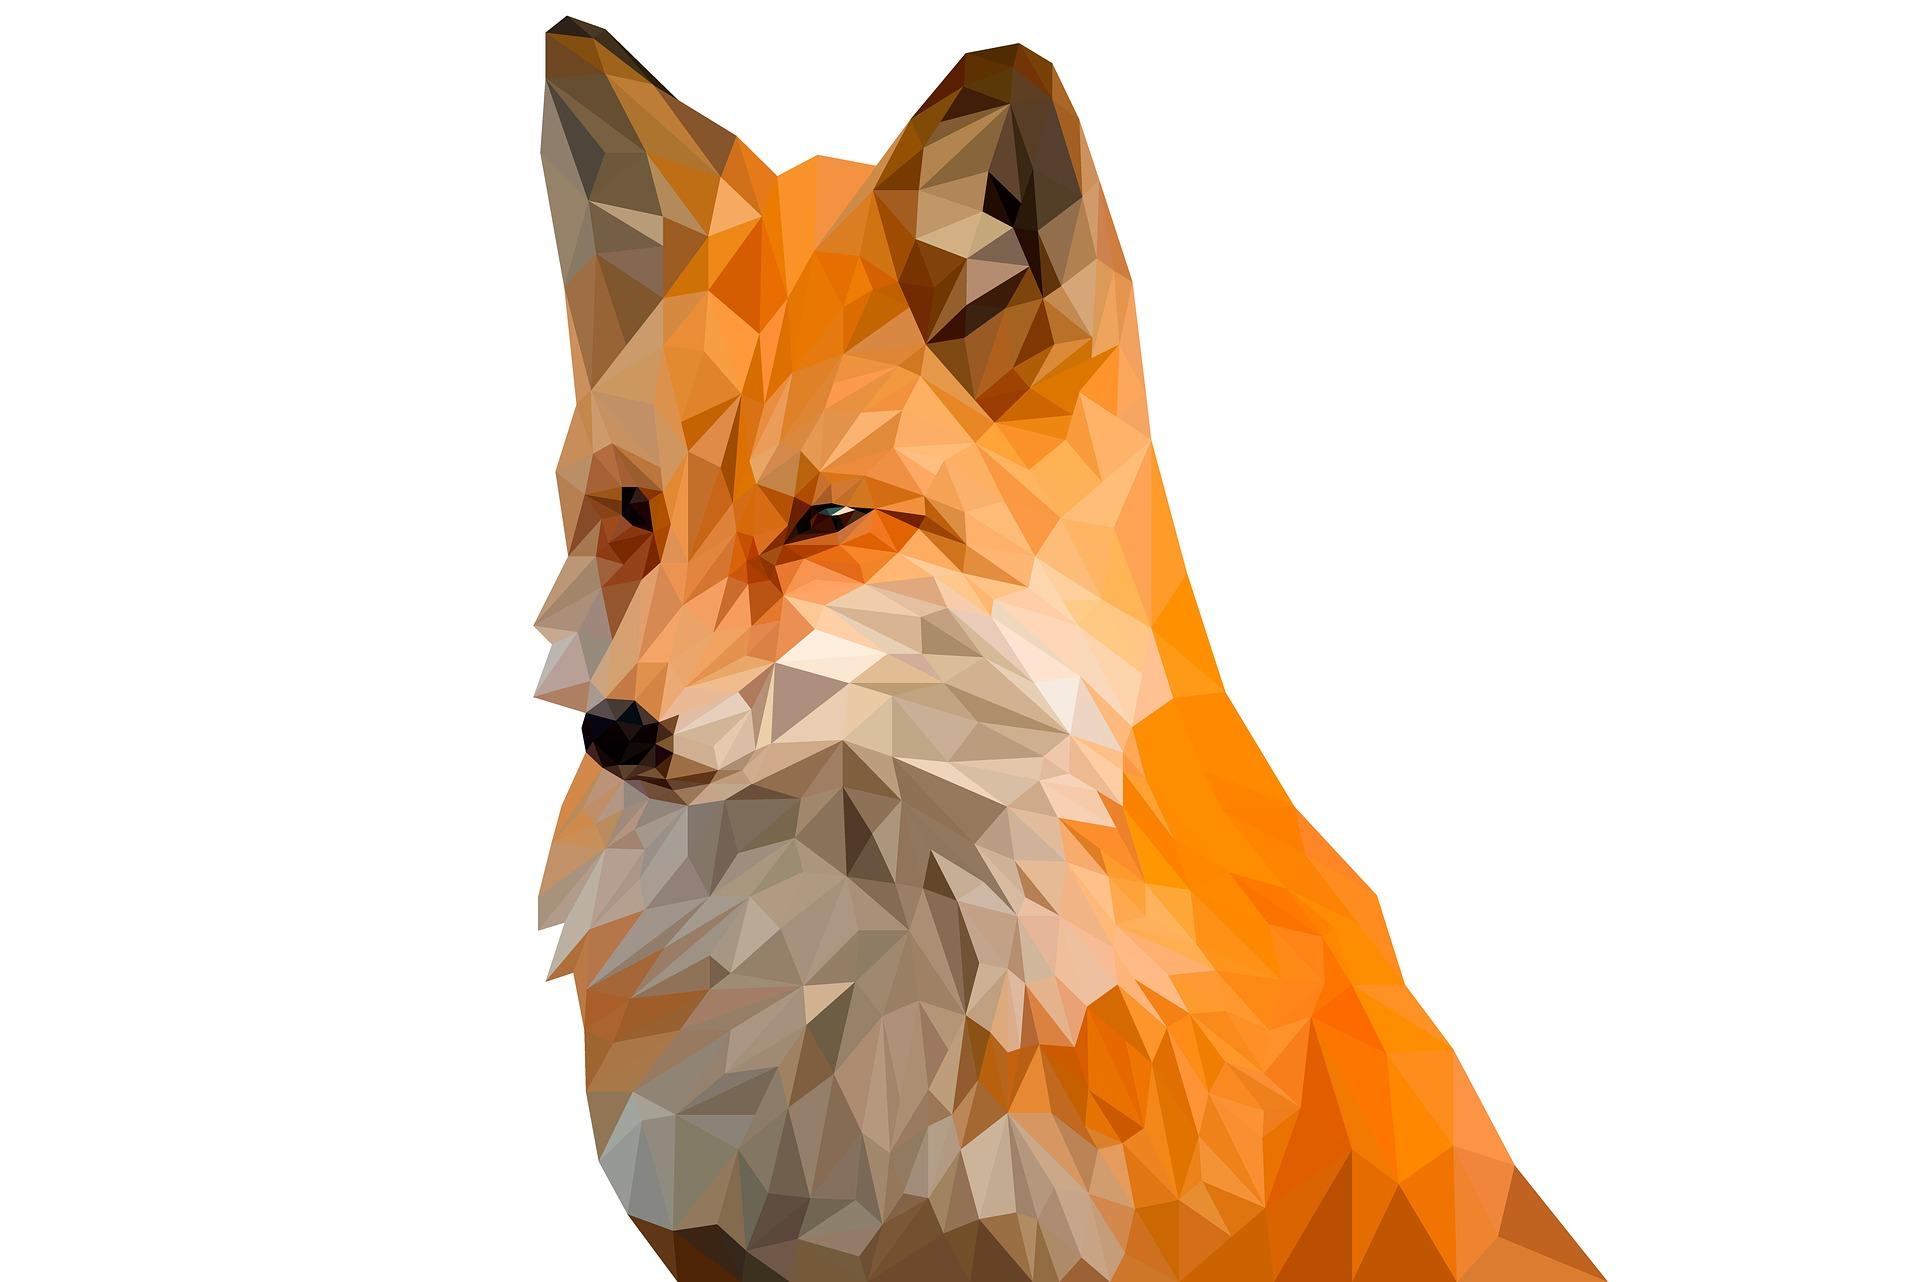 Polygon Fox - Toe Heftiba